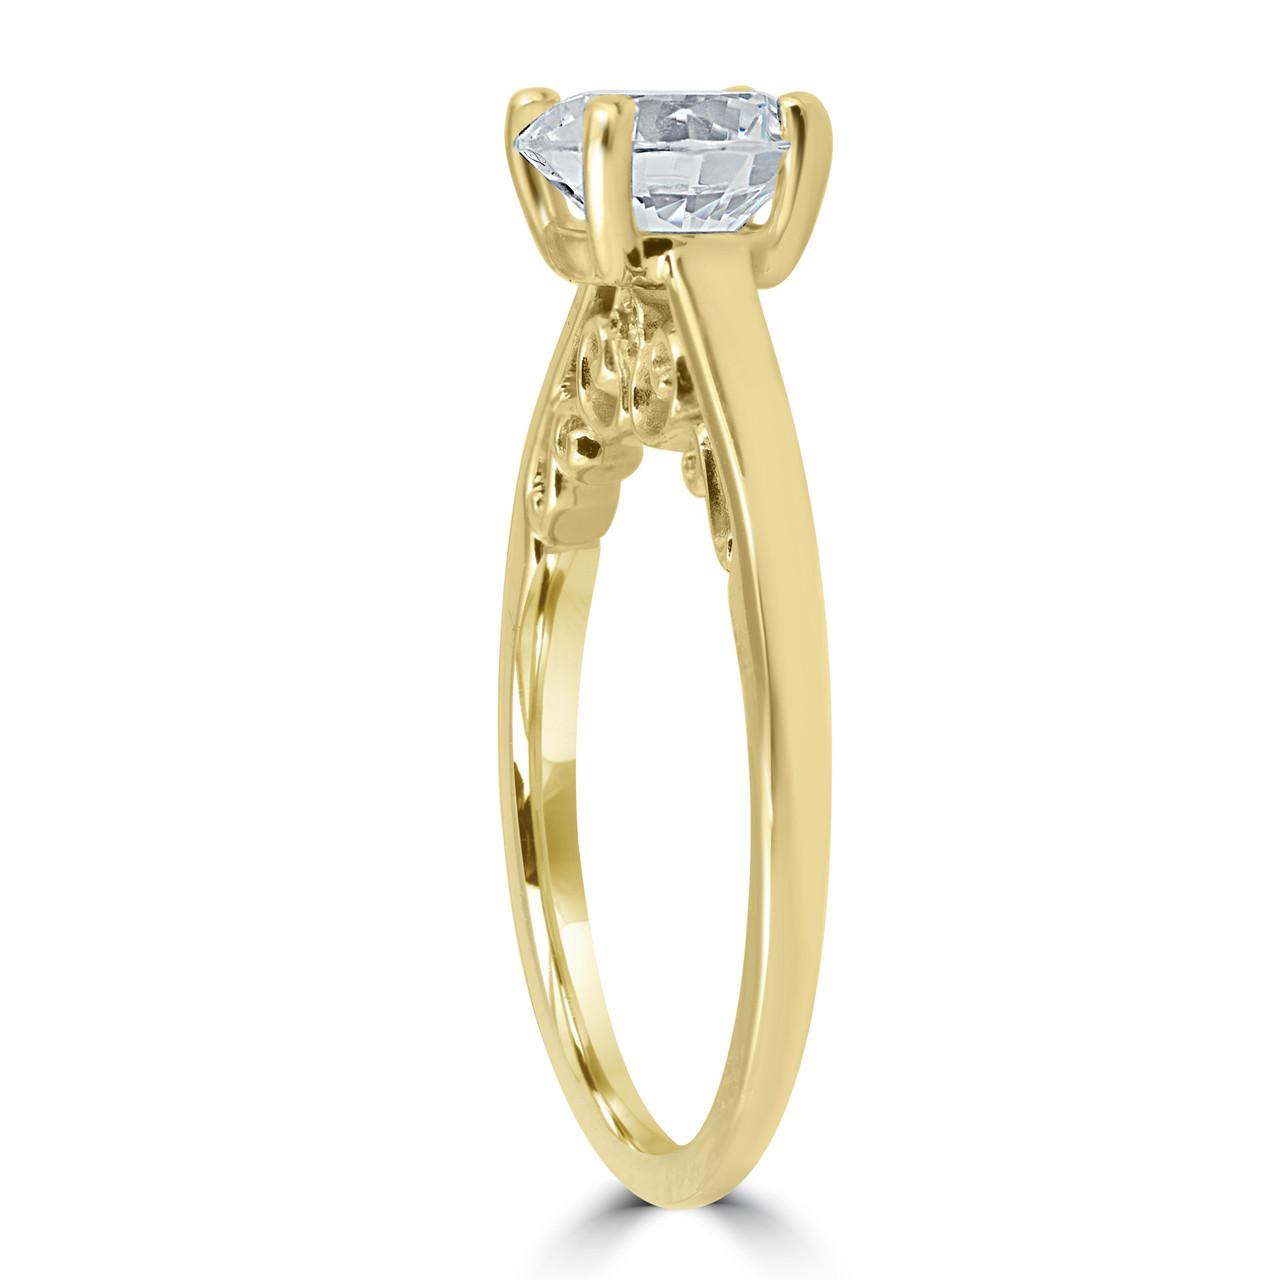 f21d2201e51 1 ct Diamond Round Brilliant Cut Solitaire Engagement Ring 14k ...